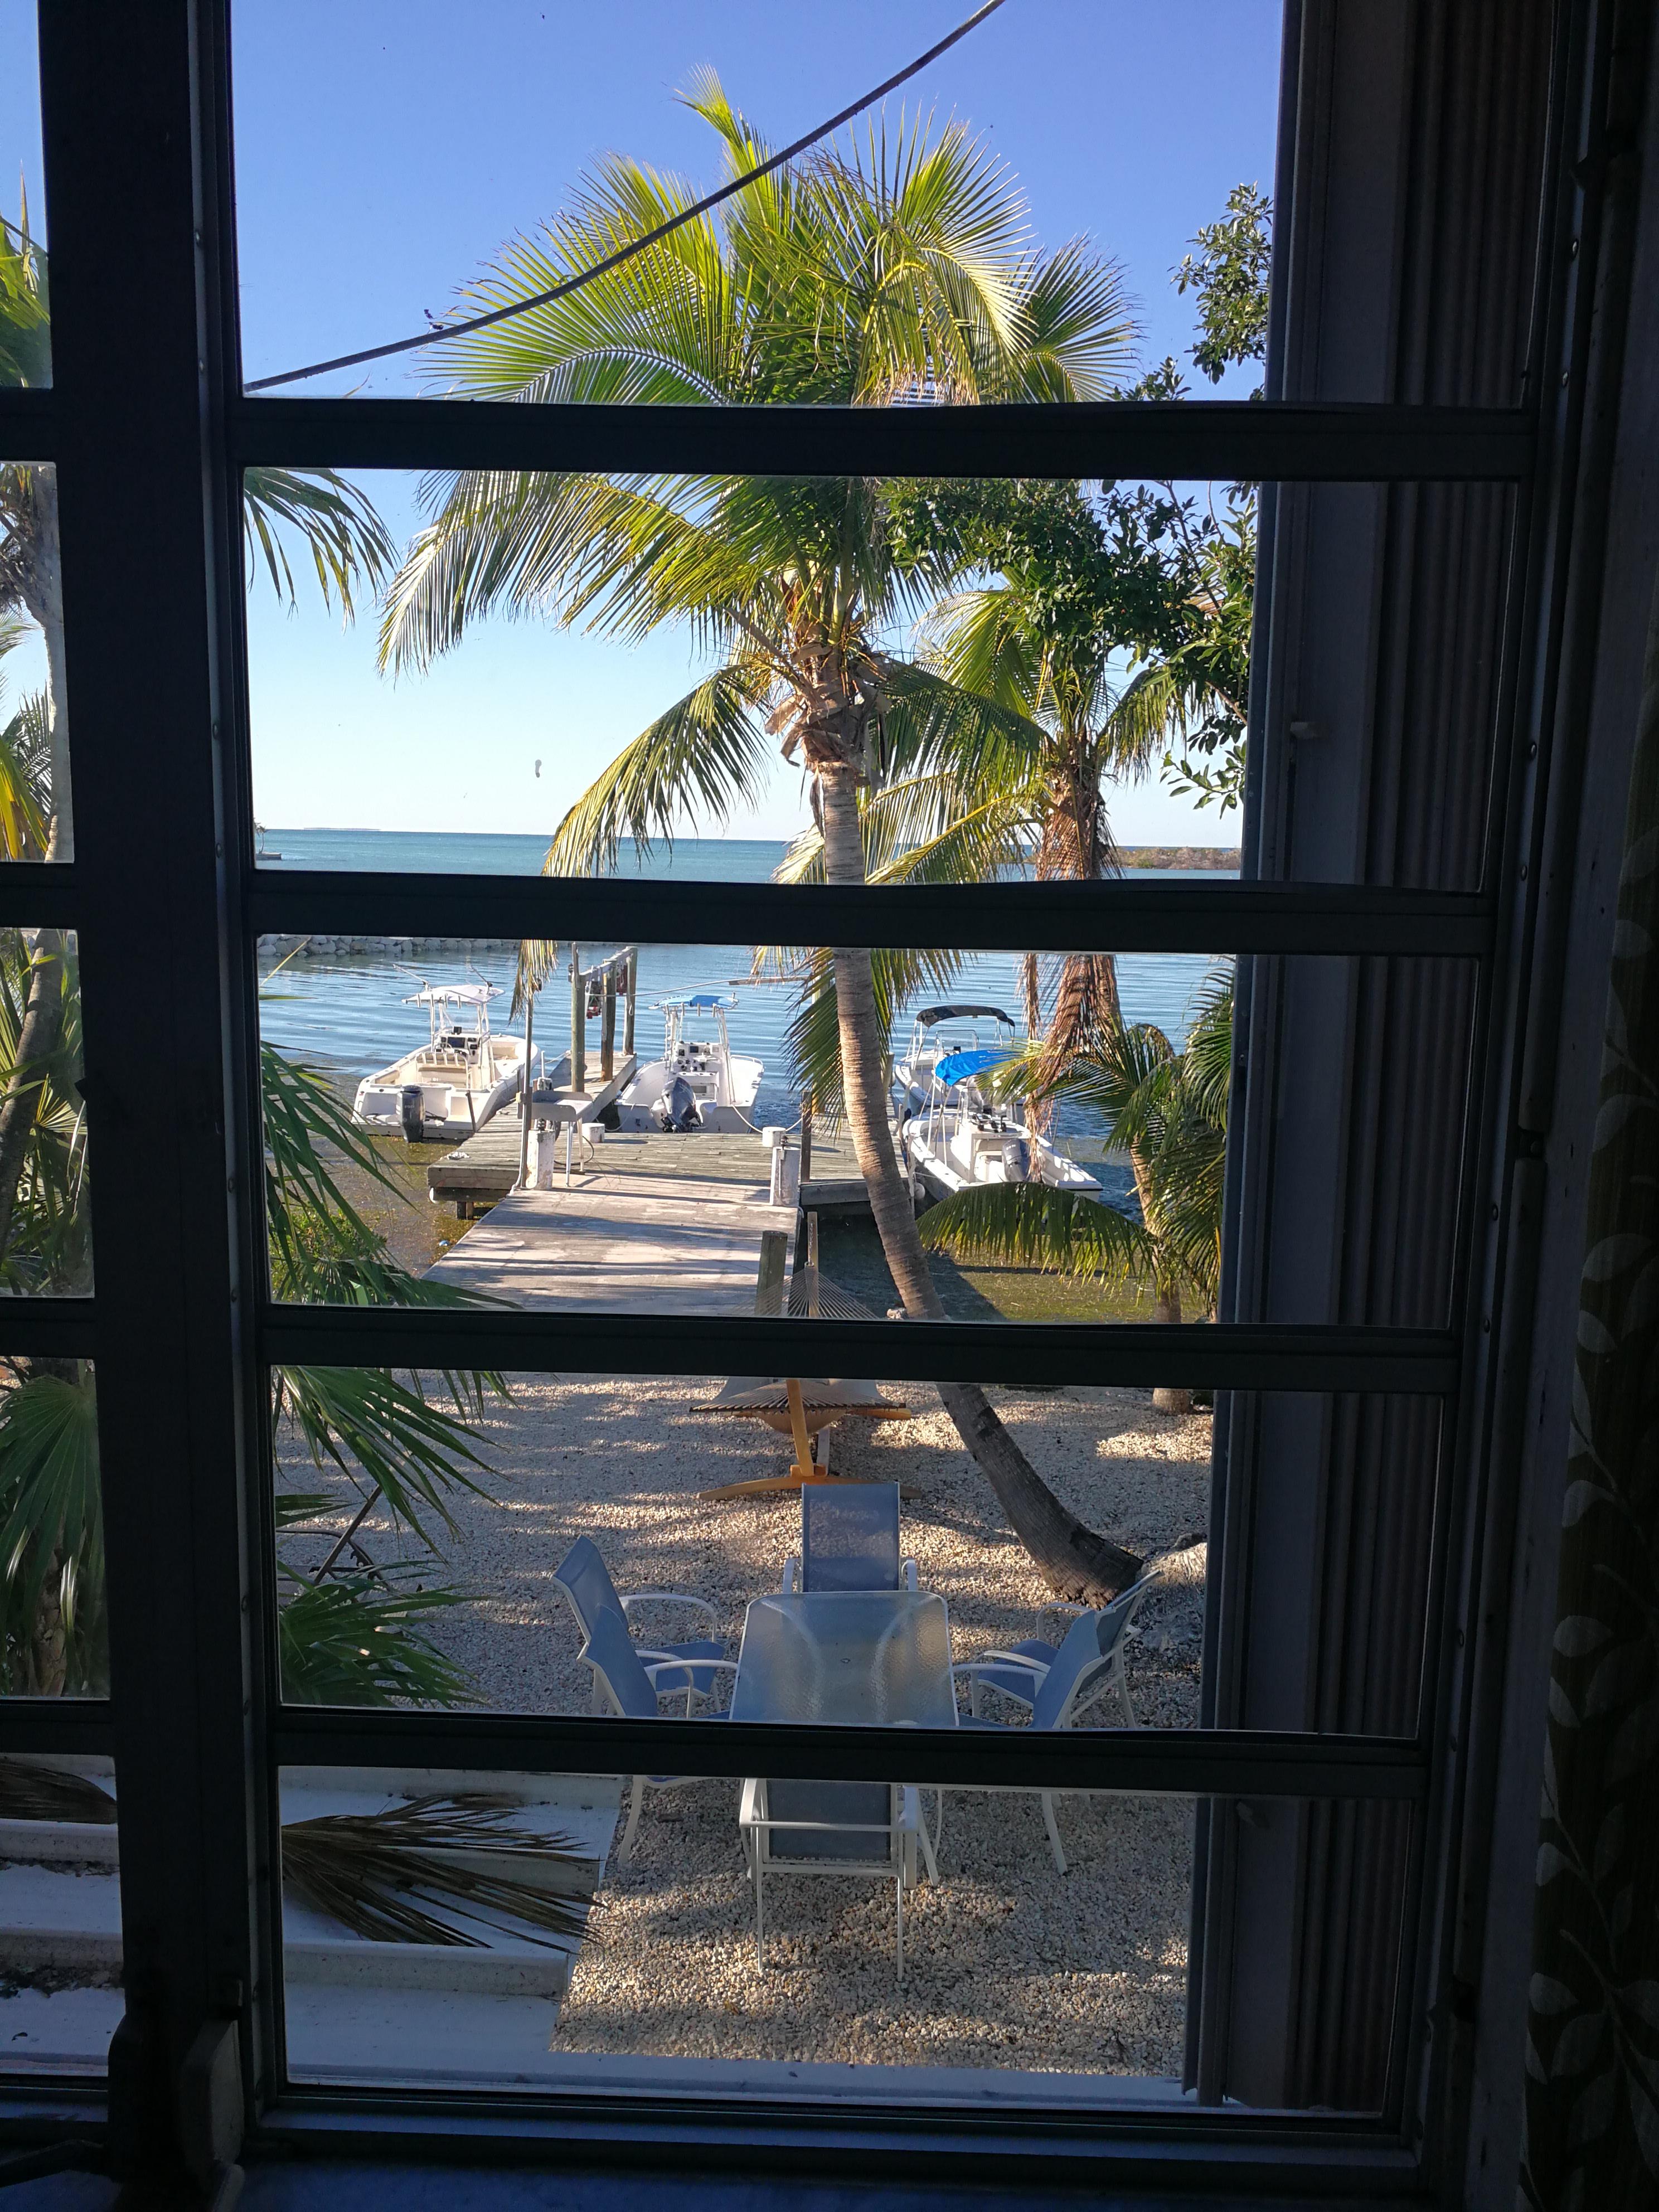 2017/12/31 - USA | Florida Keys| Marathon | Captain Pip's Marina & Hideaway - [Neujahrs-]Aussicht.